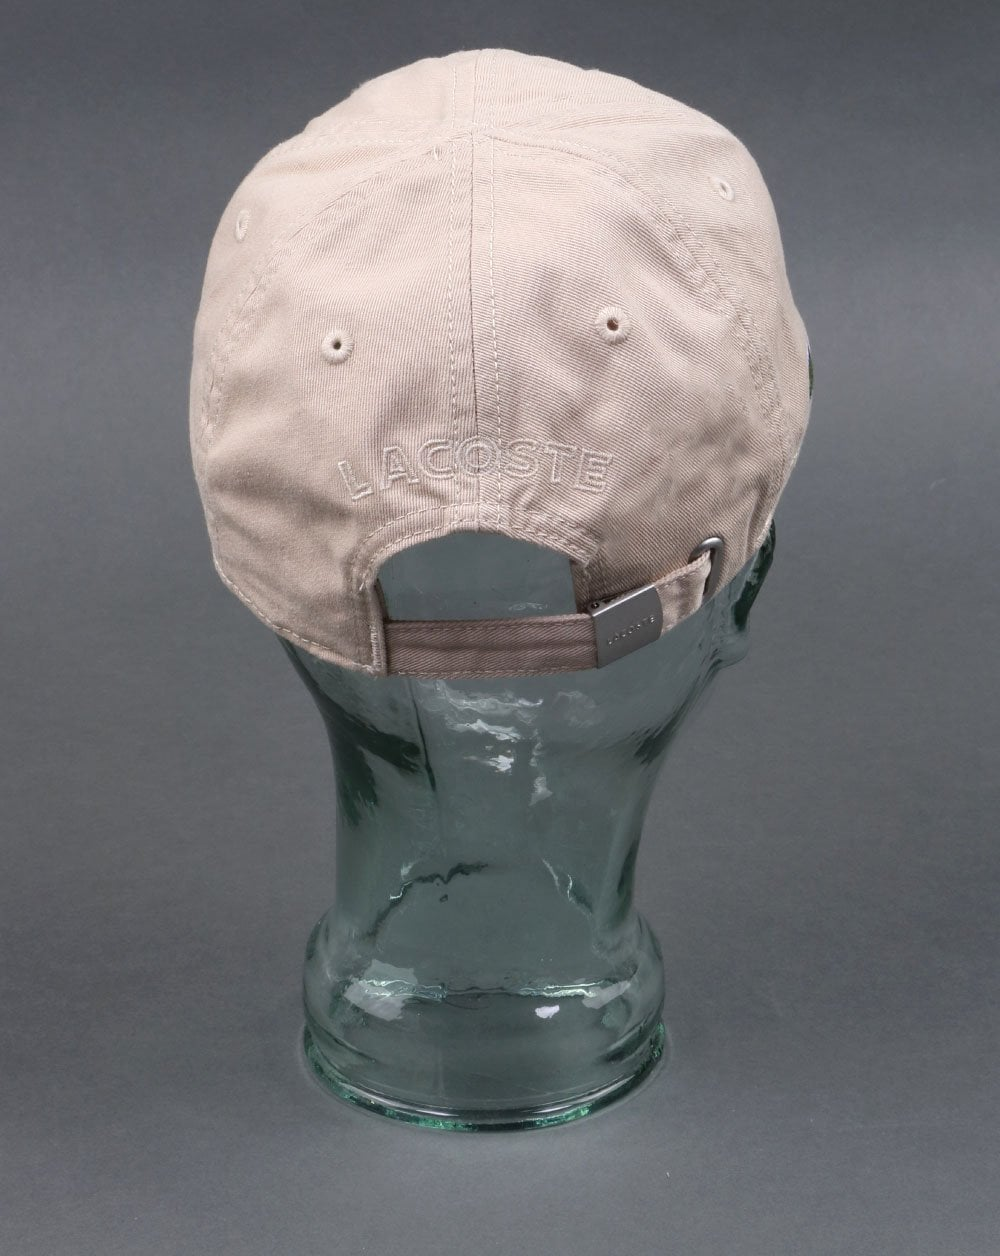 593010362 Lacoste Gabardine Cap Stone